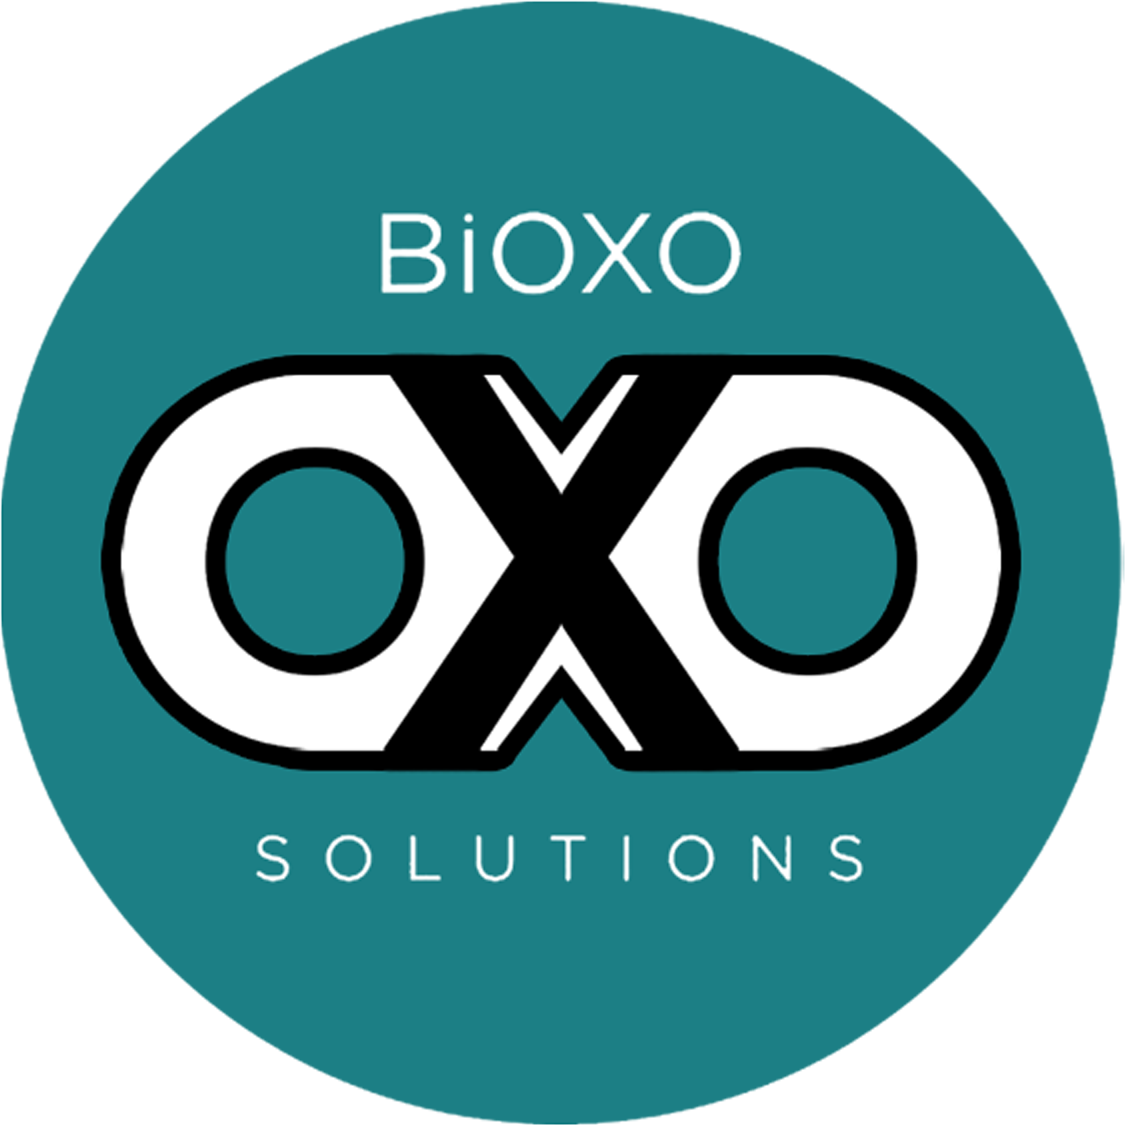 BiOXO Solutions